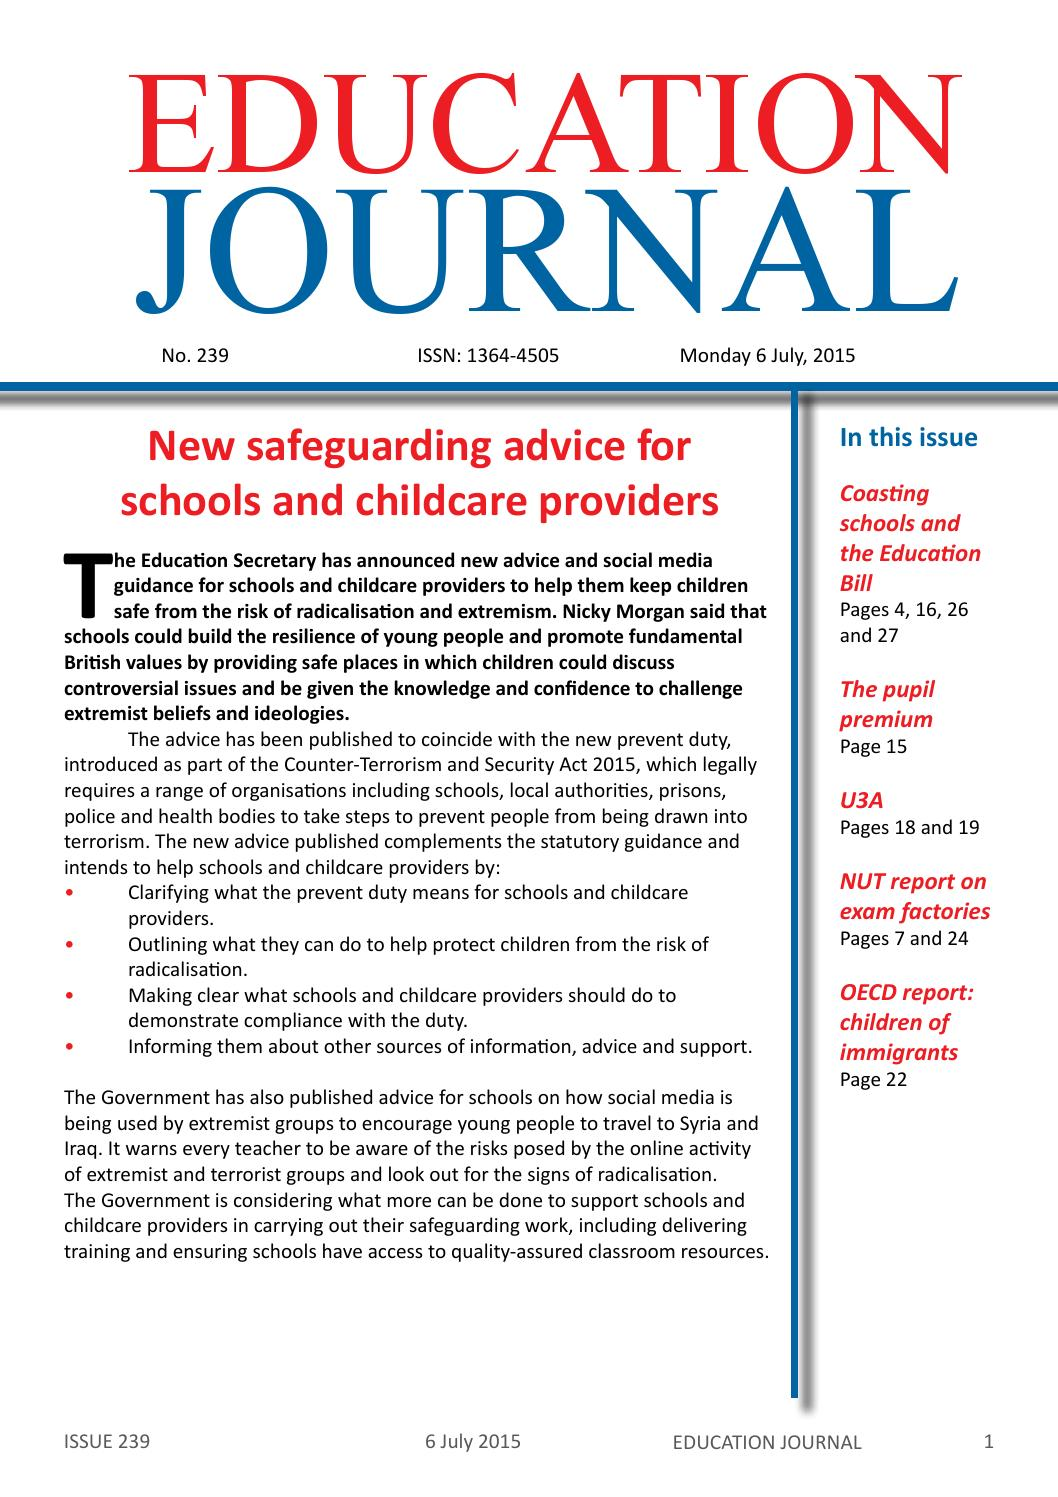 Education Journal No. 239 by publicinterventionus - Issuu